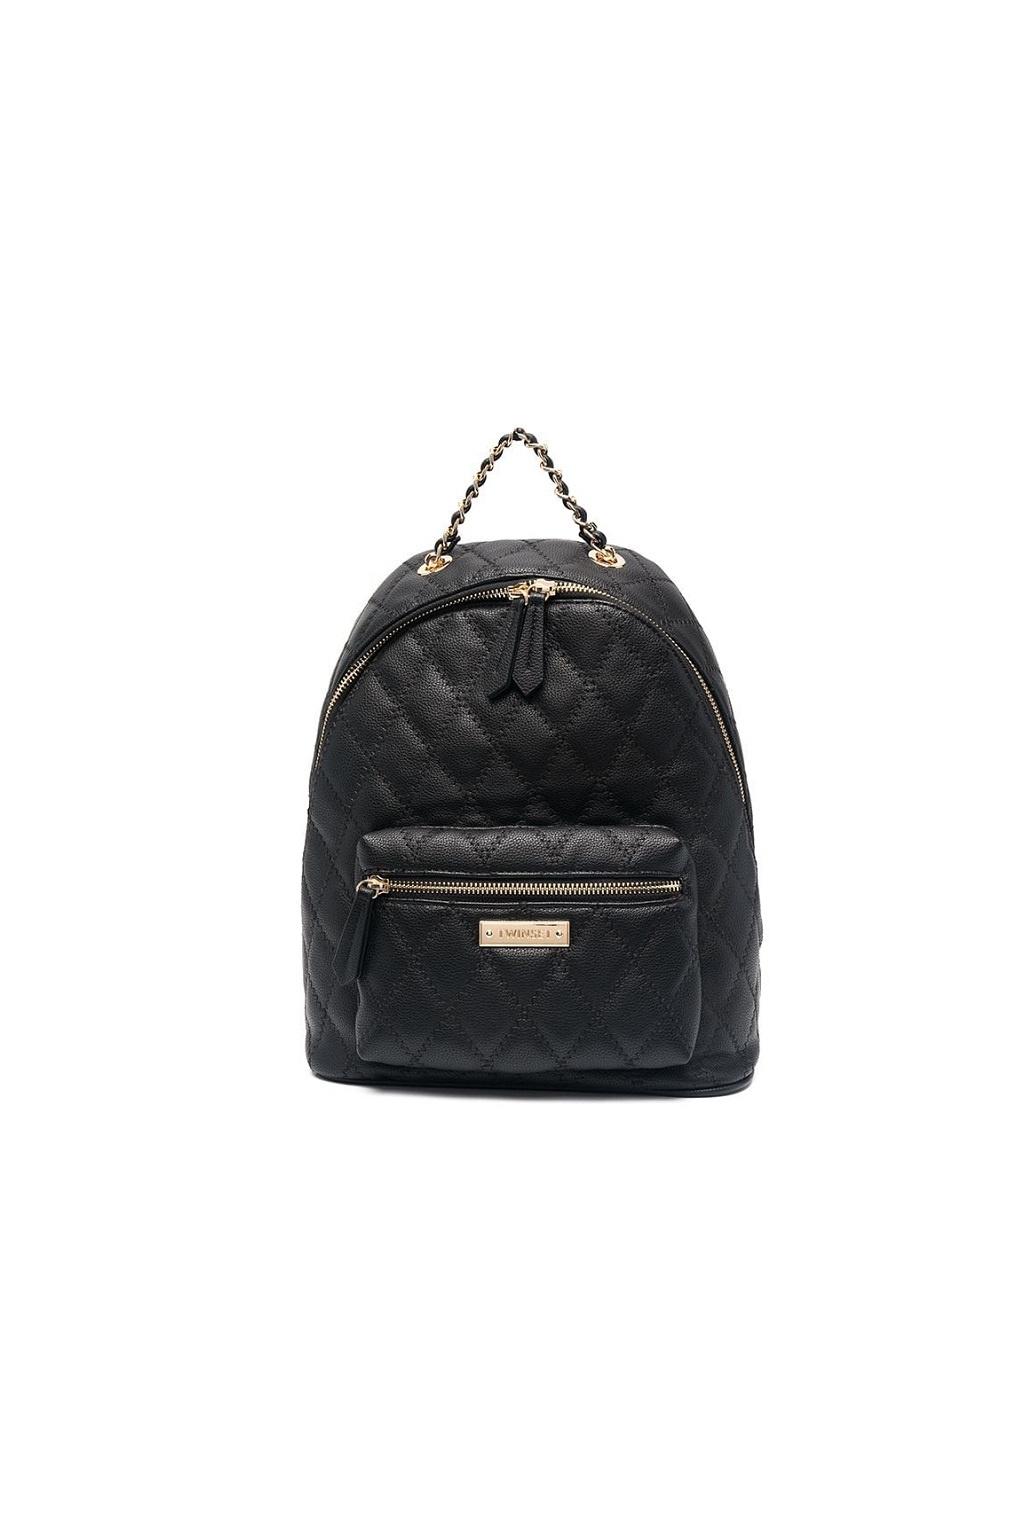 Dámský batoh Twinset 202TB7012 černý